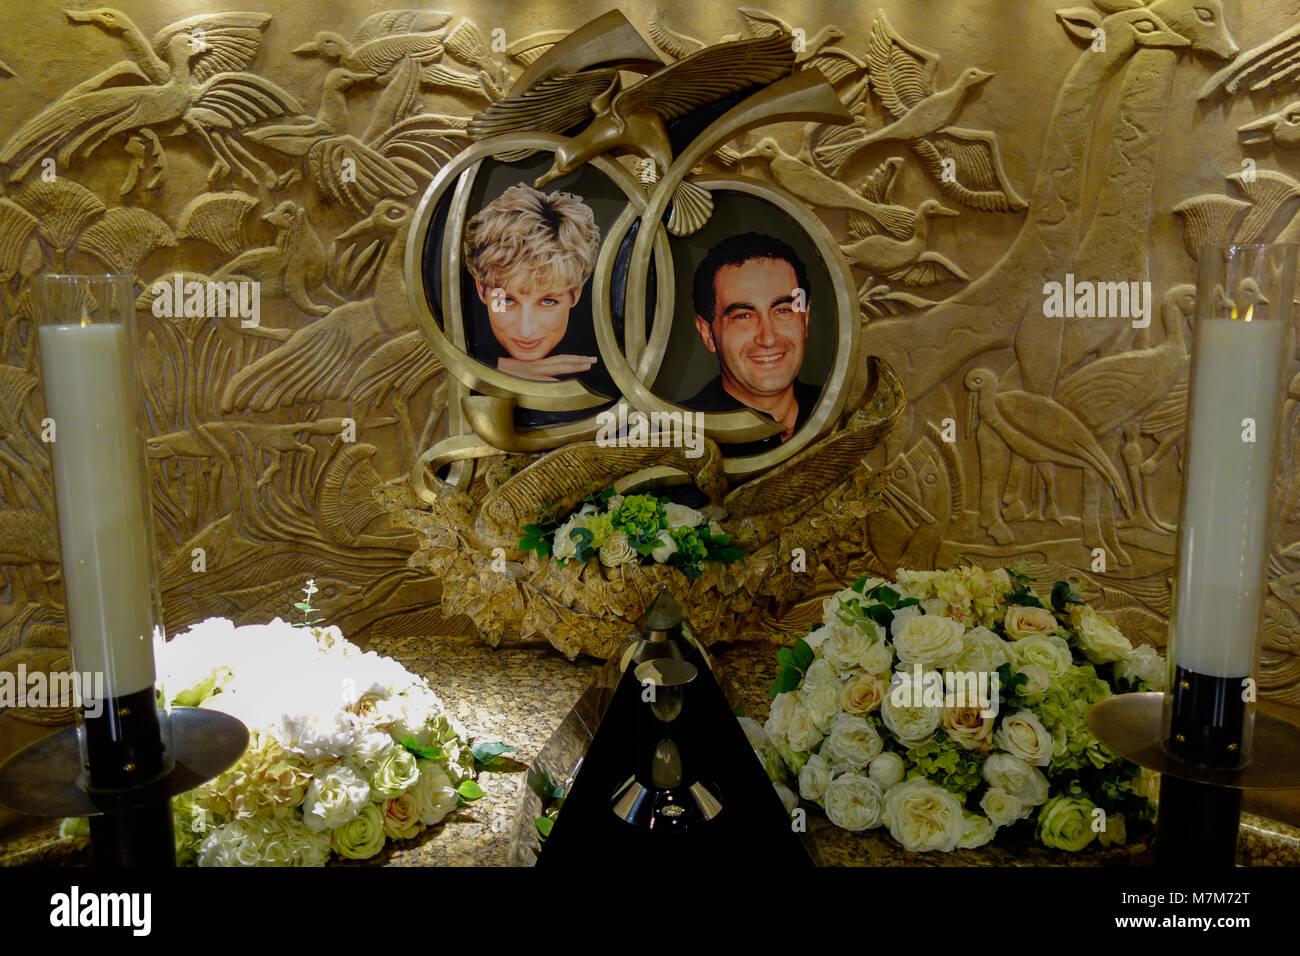 Prinzessin Diana von Wales und Dodi Fayed memorial Harrods Knightsbridge London, England. Stockbild